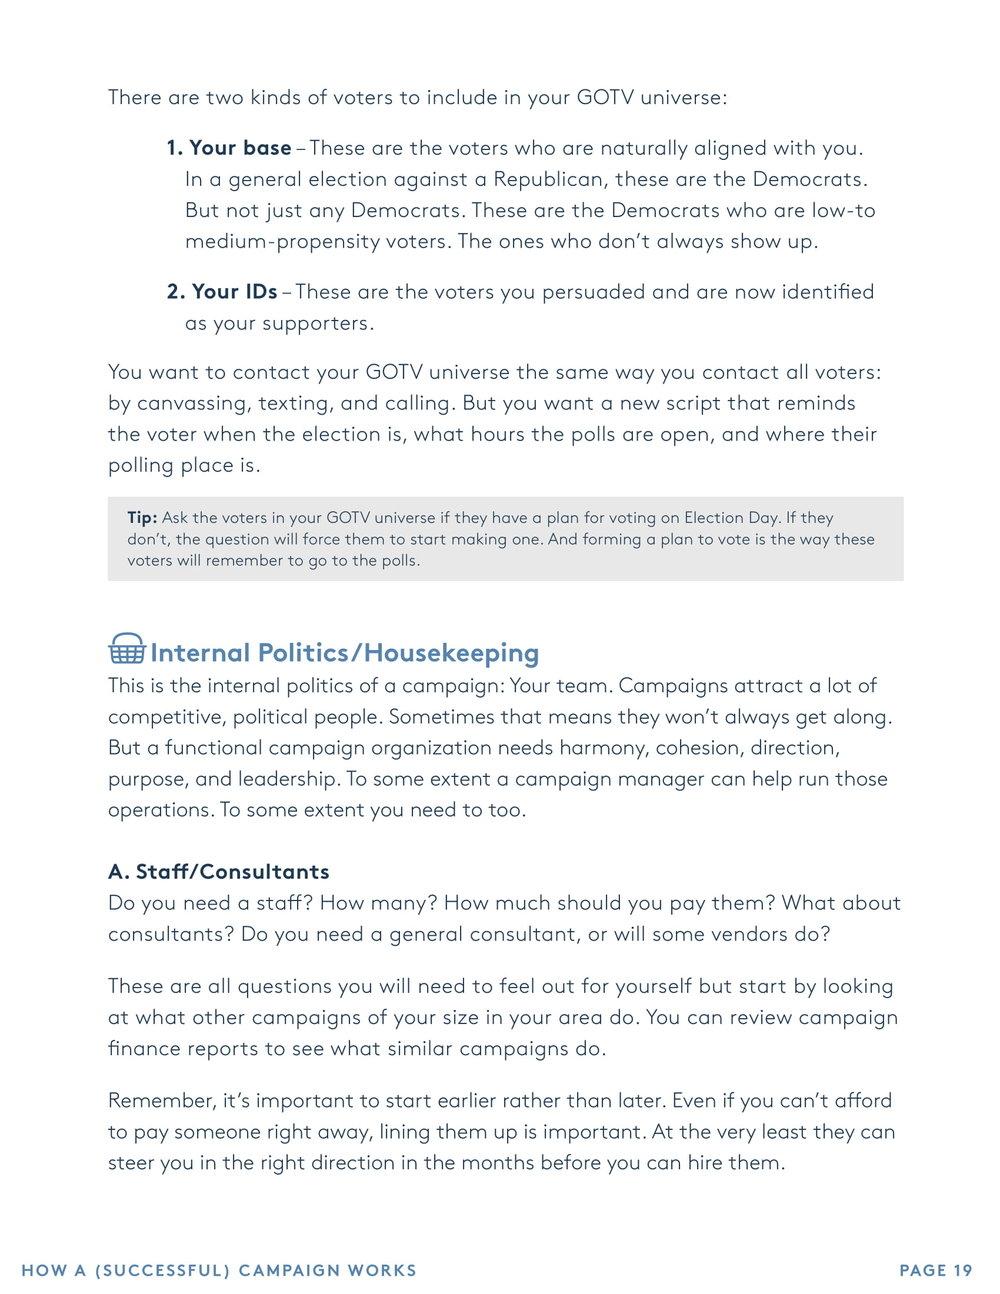 HSG_CampaignGuide_v5-19.jpg